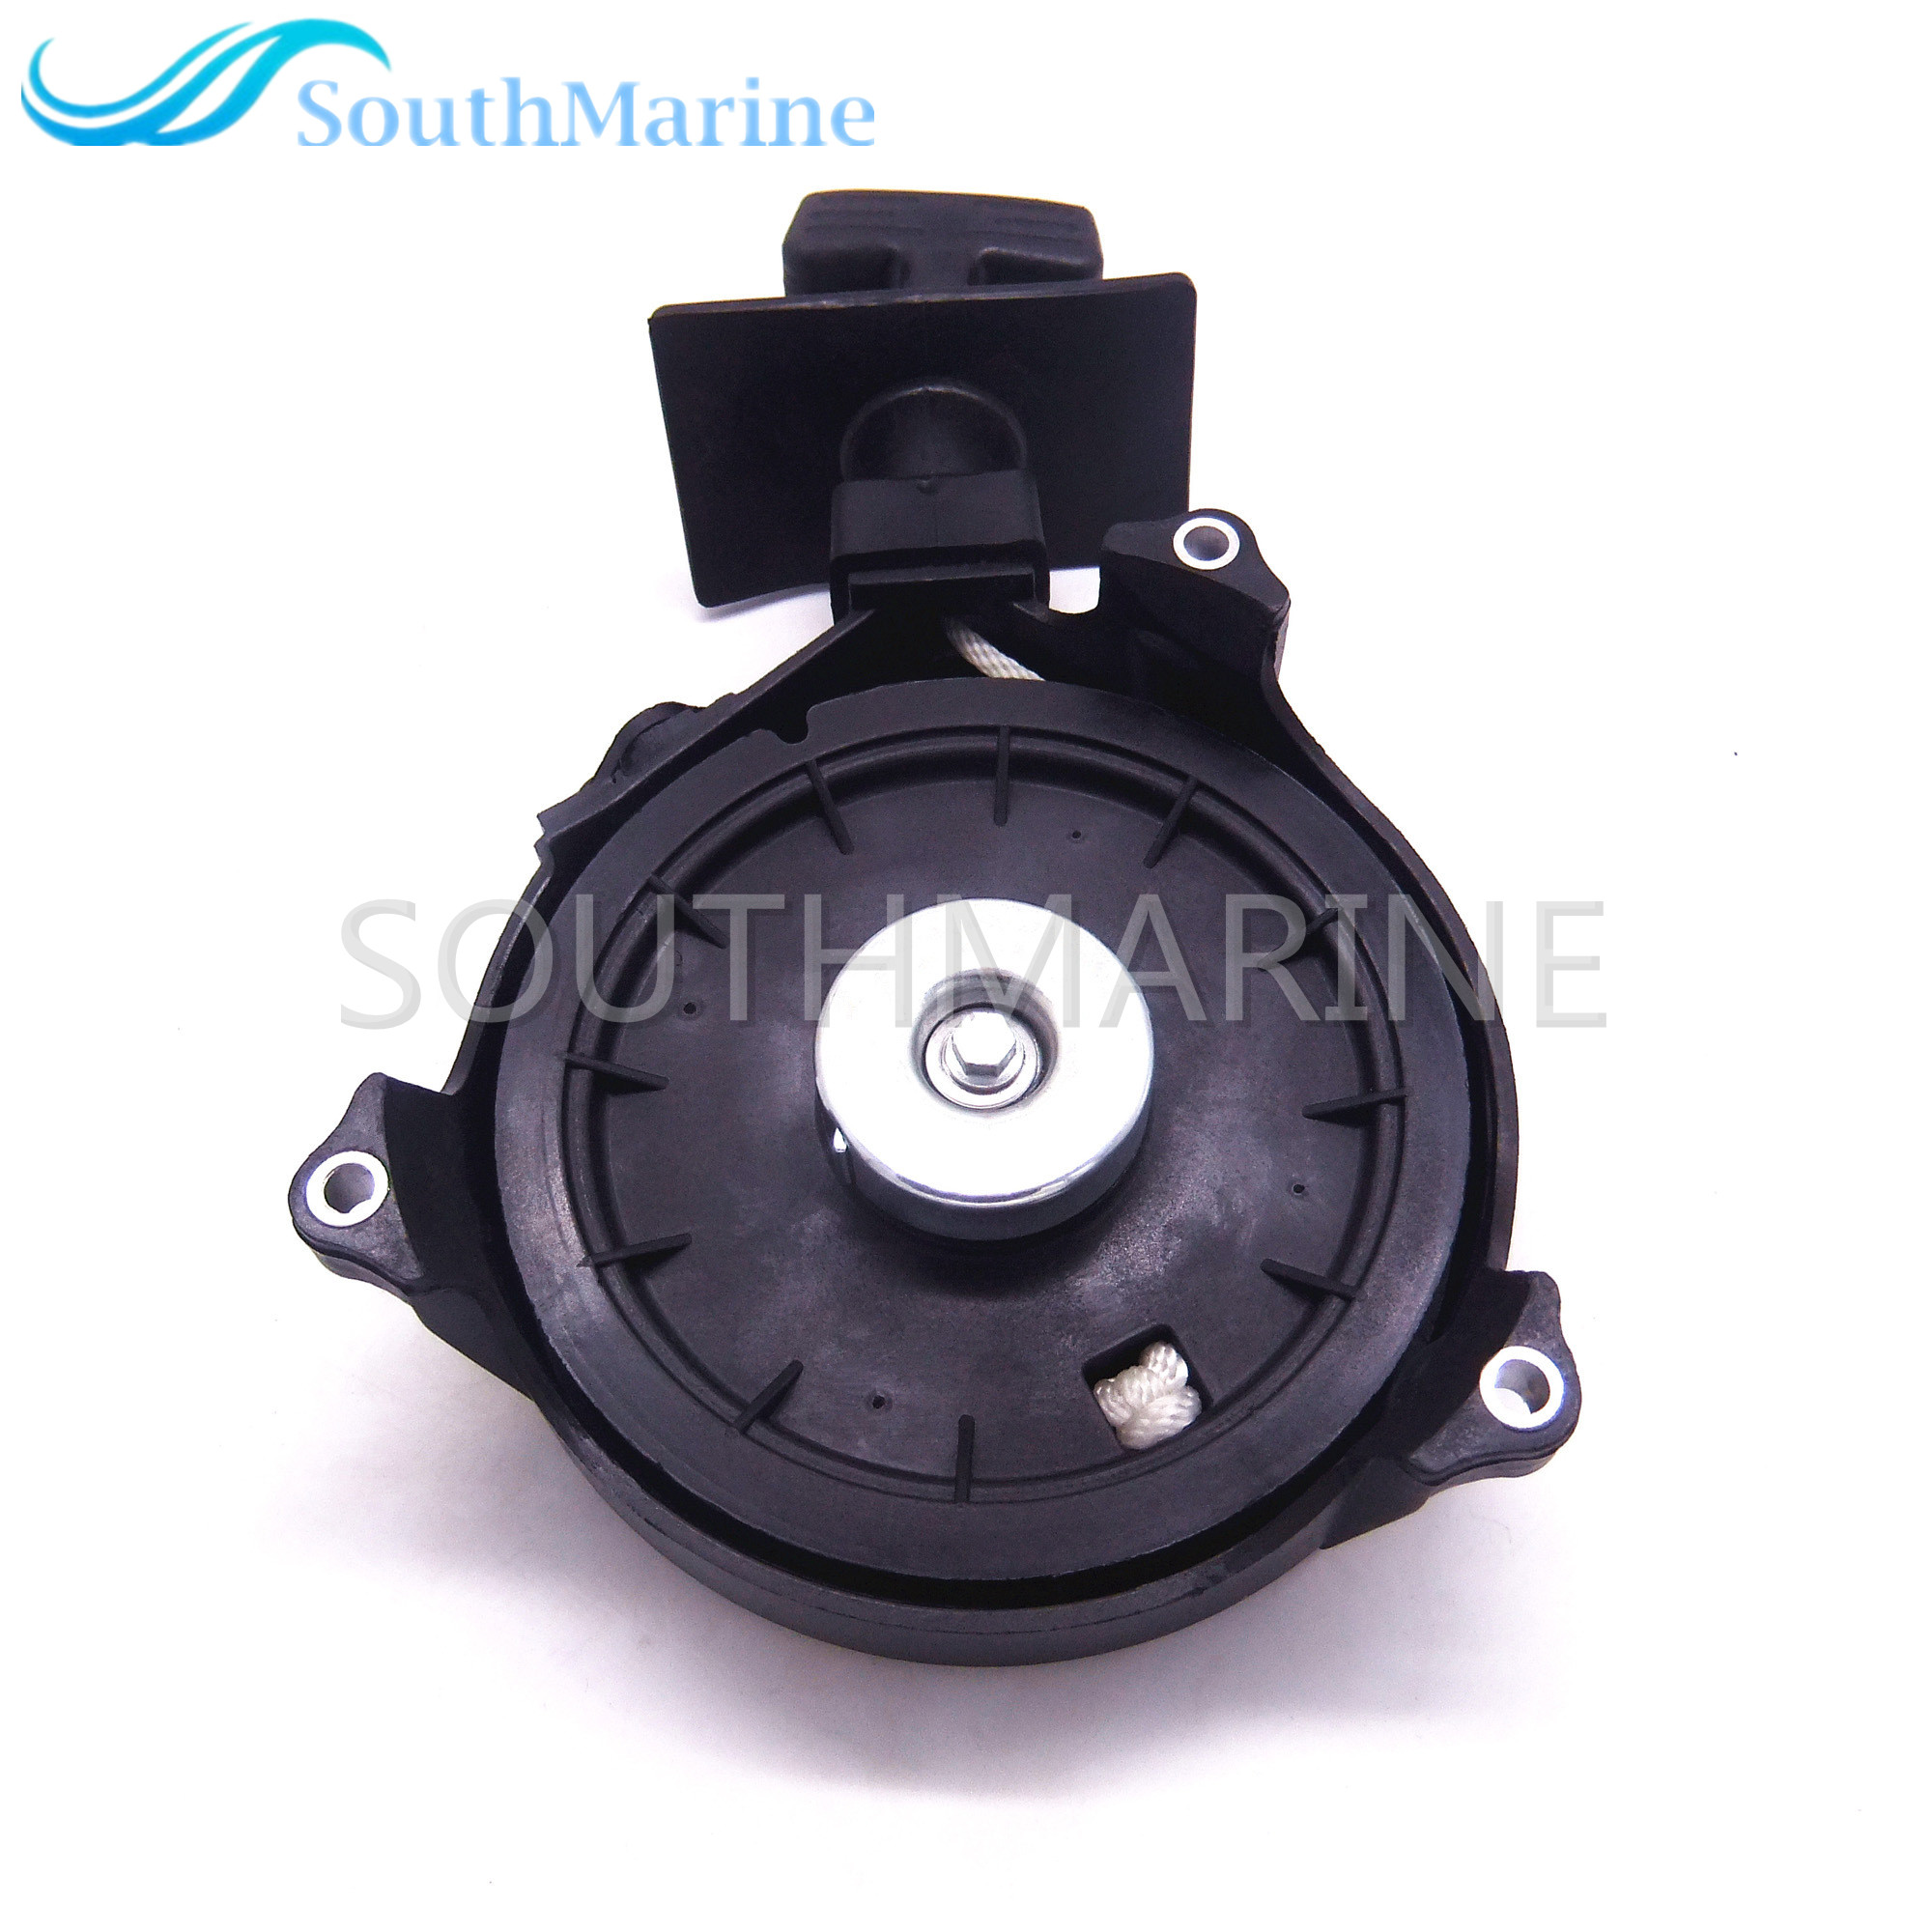 Sunsong 3401214 Power Steering Pressure Line Hose Assembly